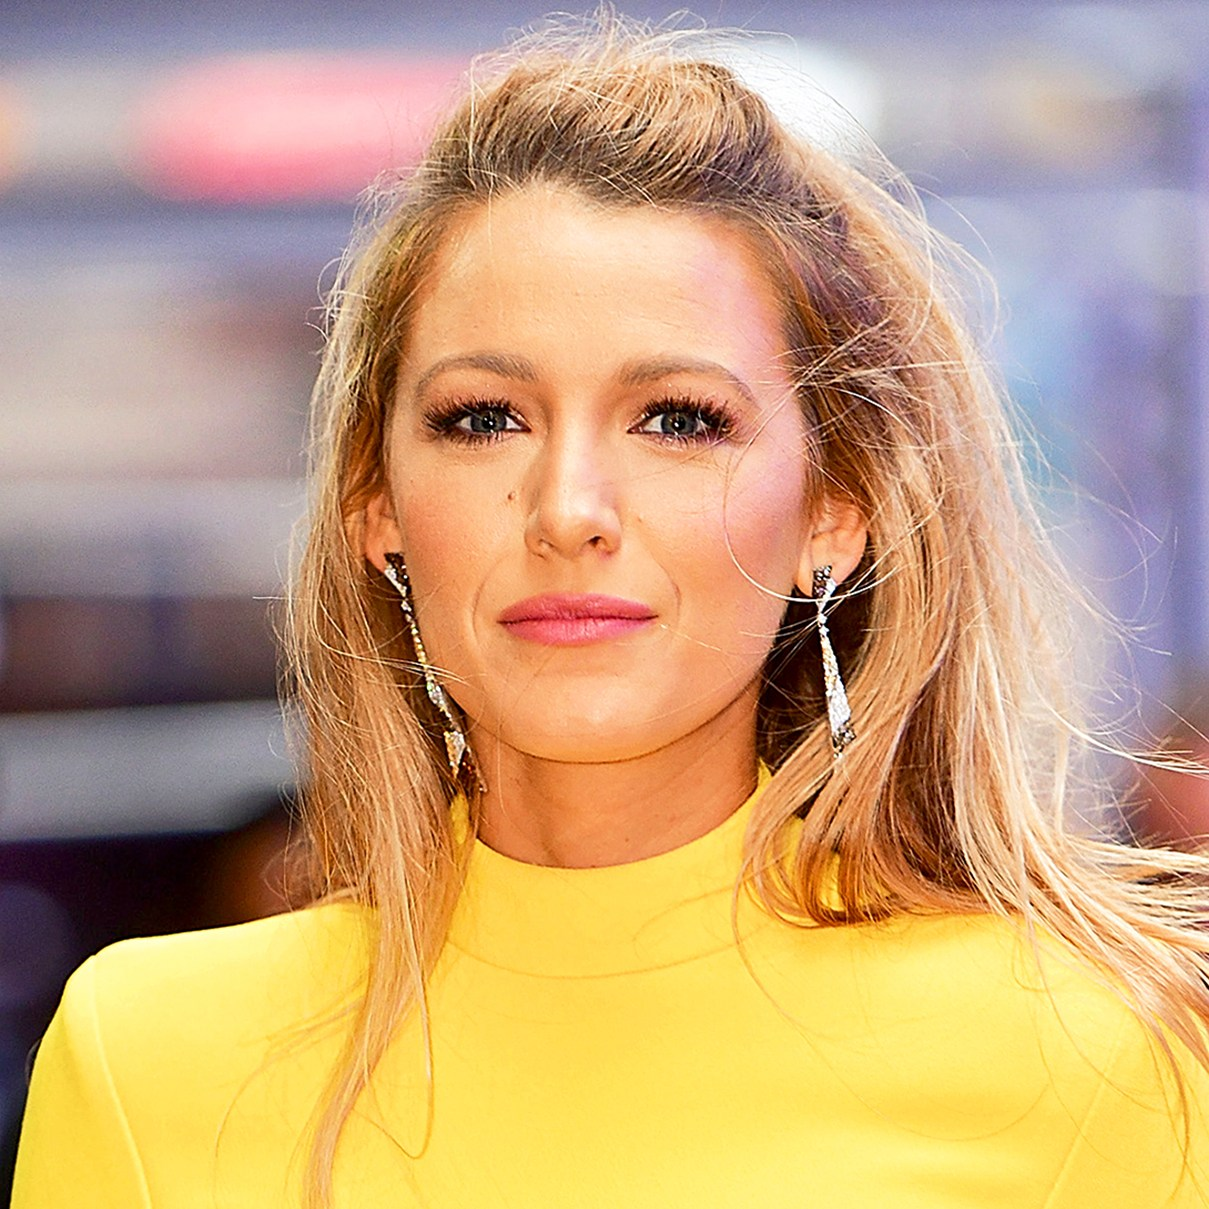 Blake Lively arrives to 'Good Morning America' in New York City.